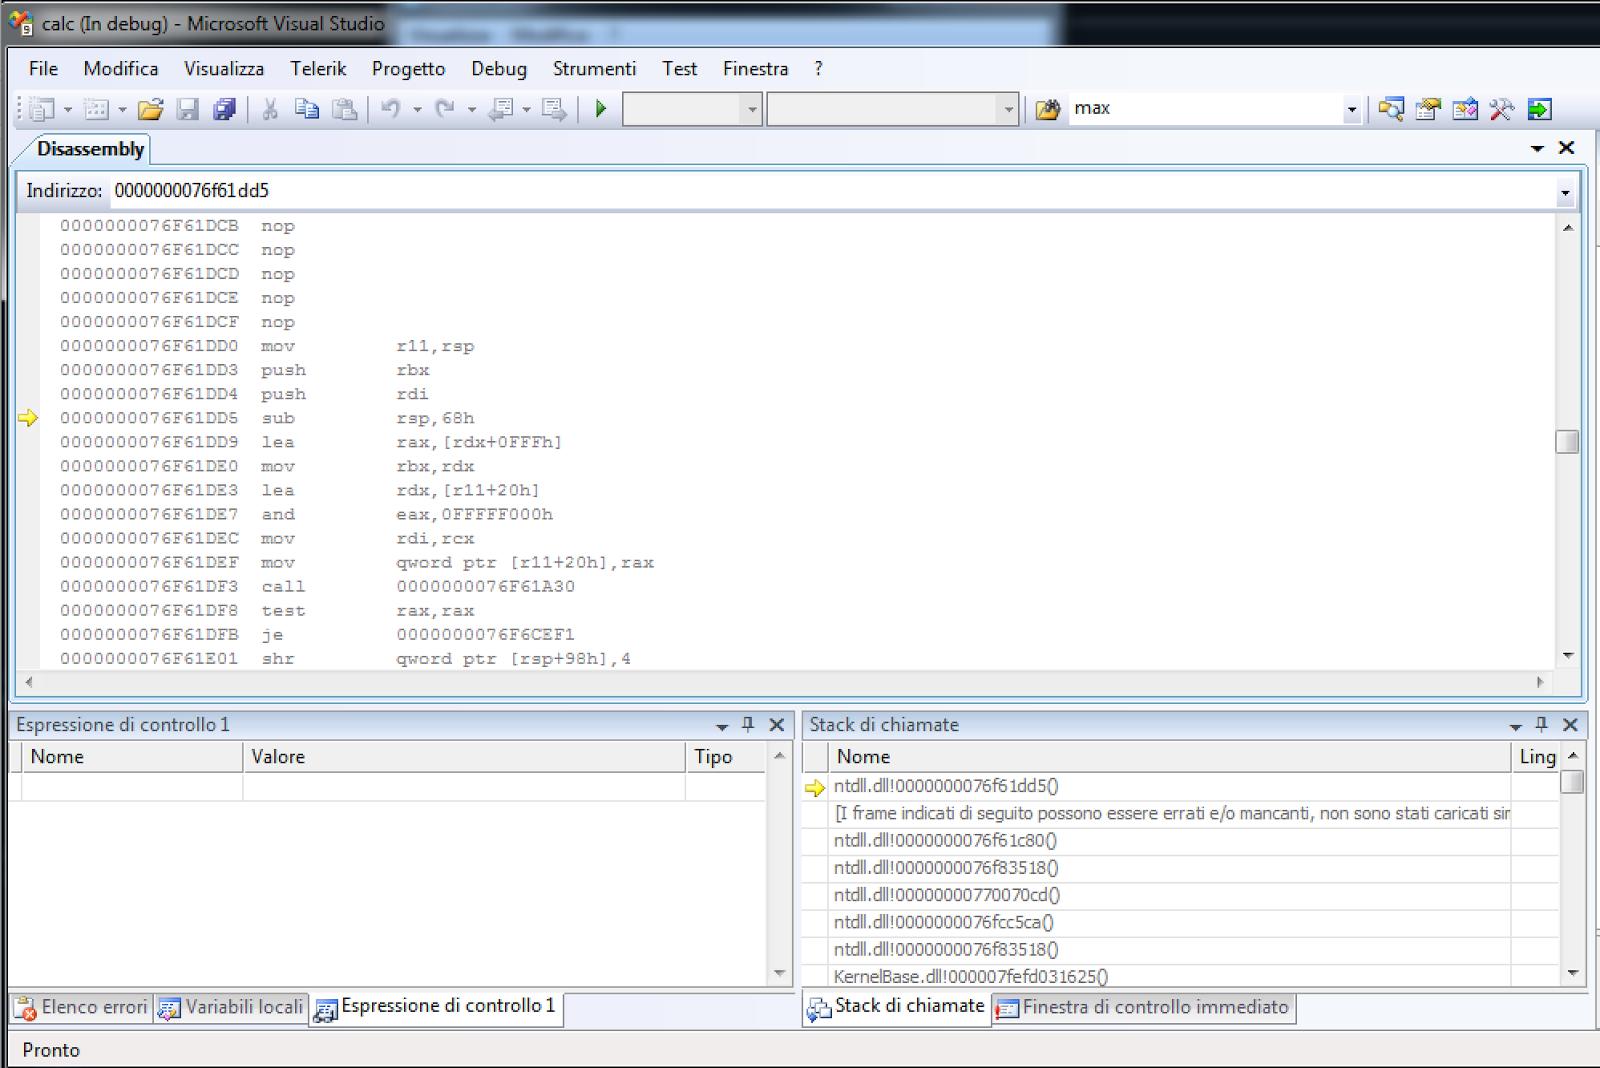 Marco Ramilli's Blog: BUG in WinCalc.exe